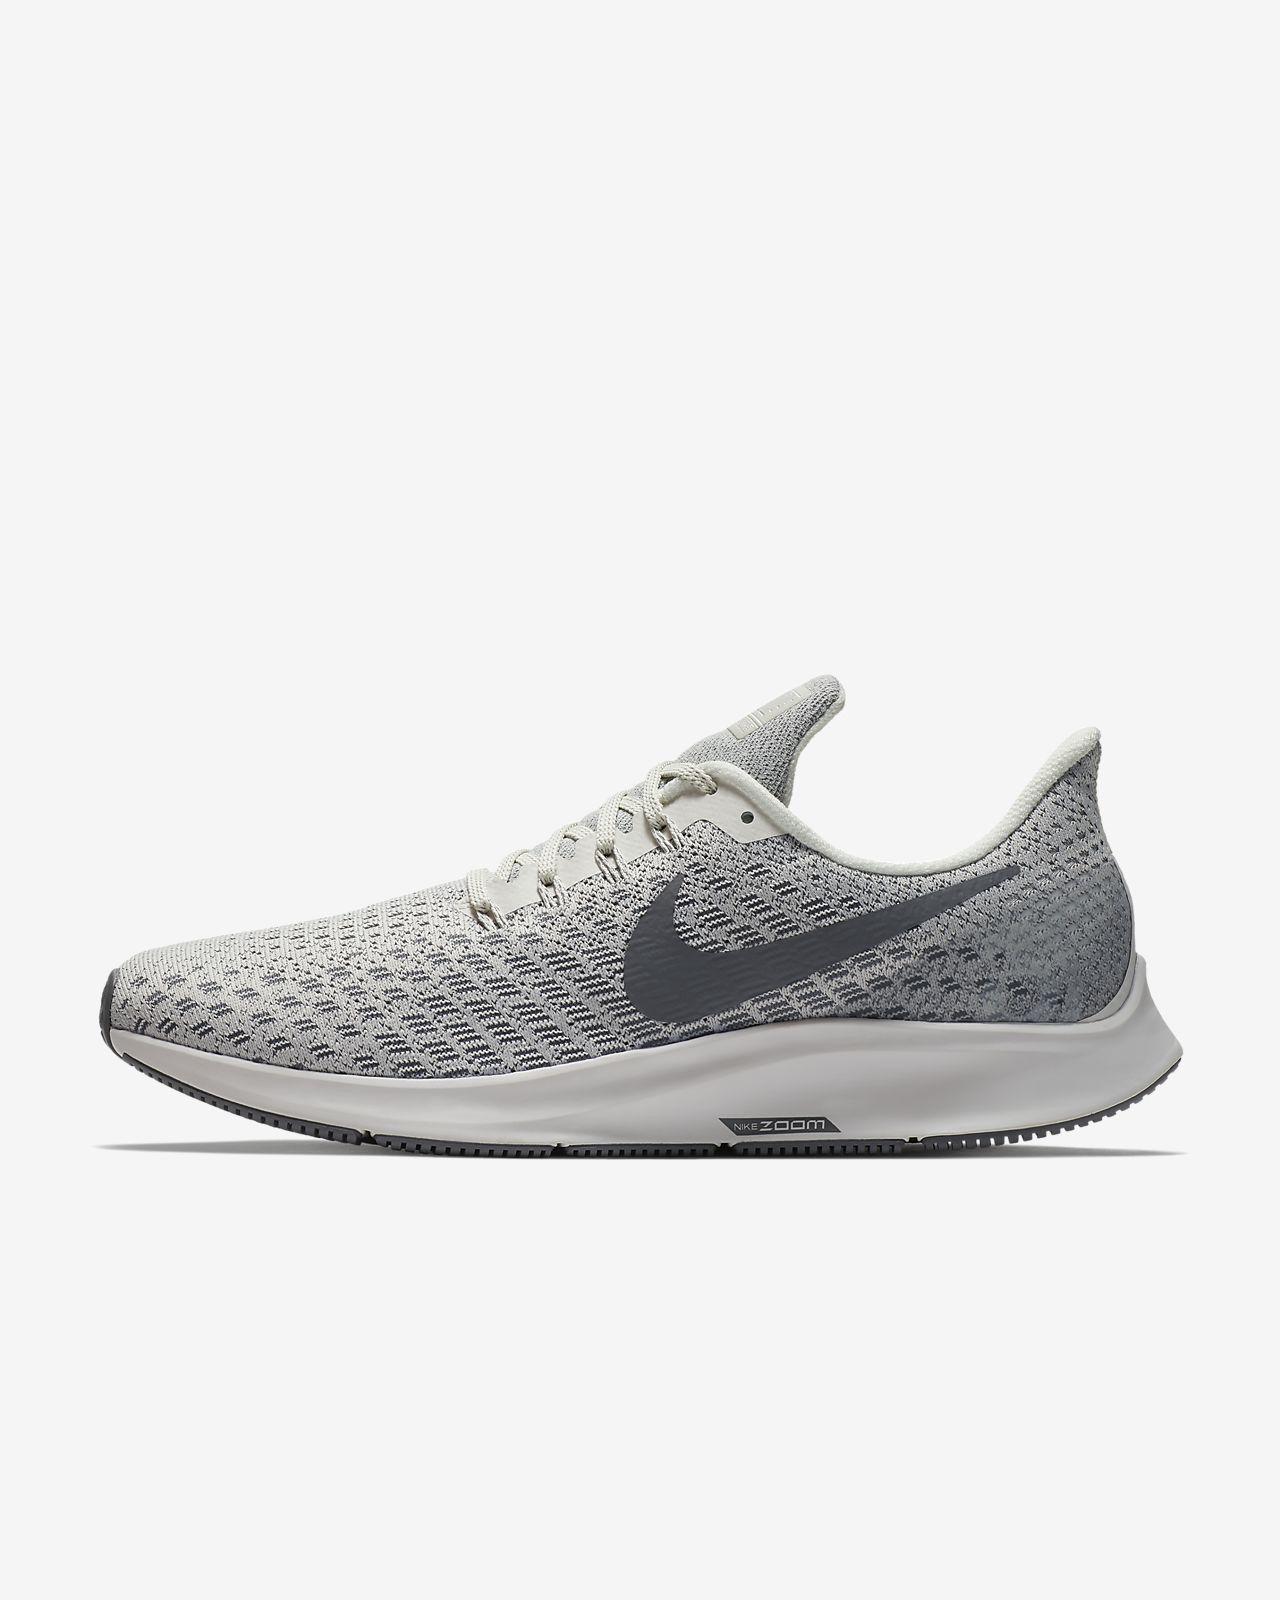 Nike Air Zoom Pegasus 35 Men's Running Shoe 12.5 en 2020